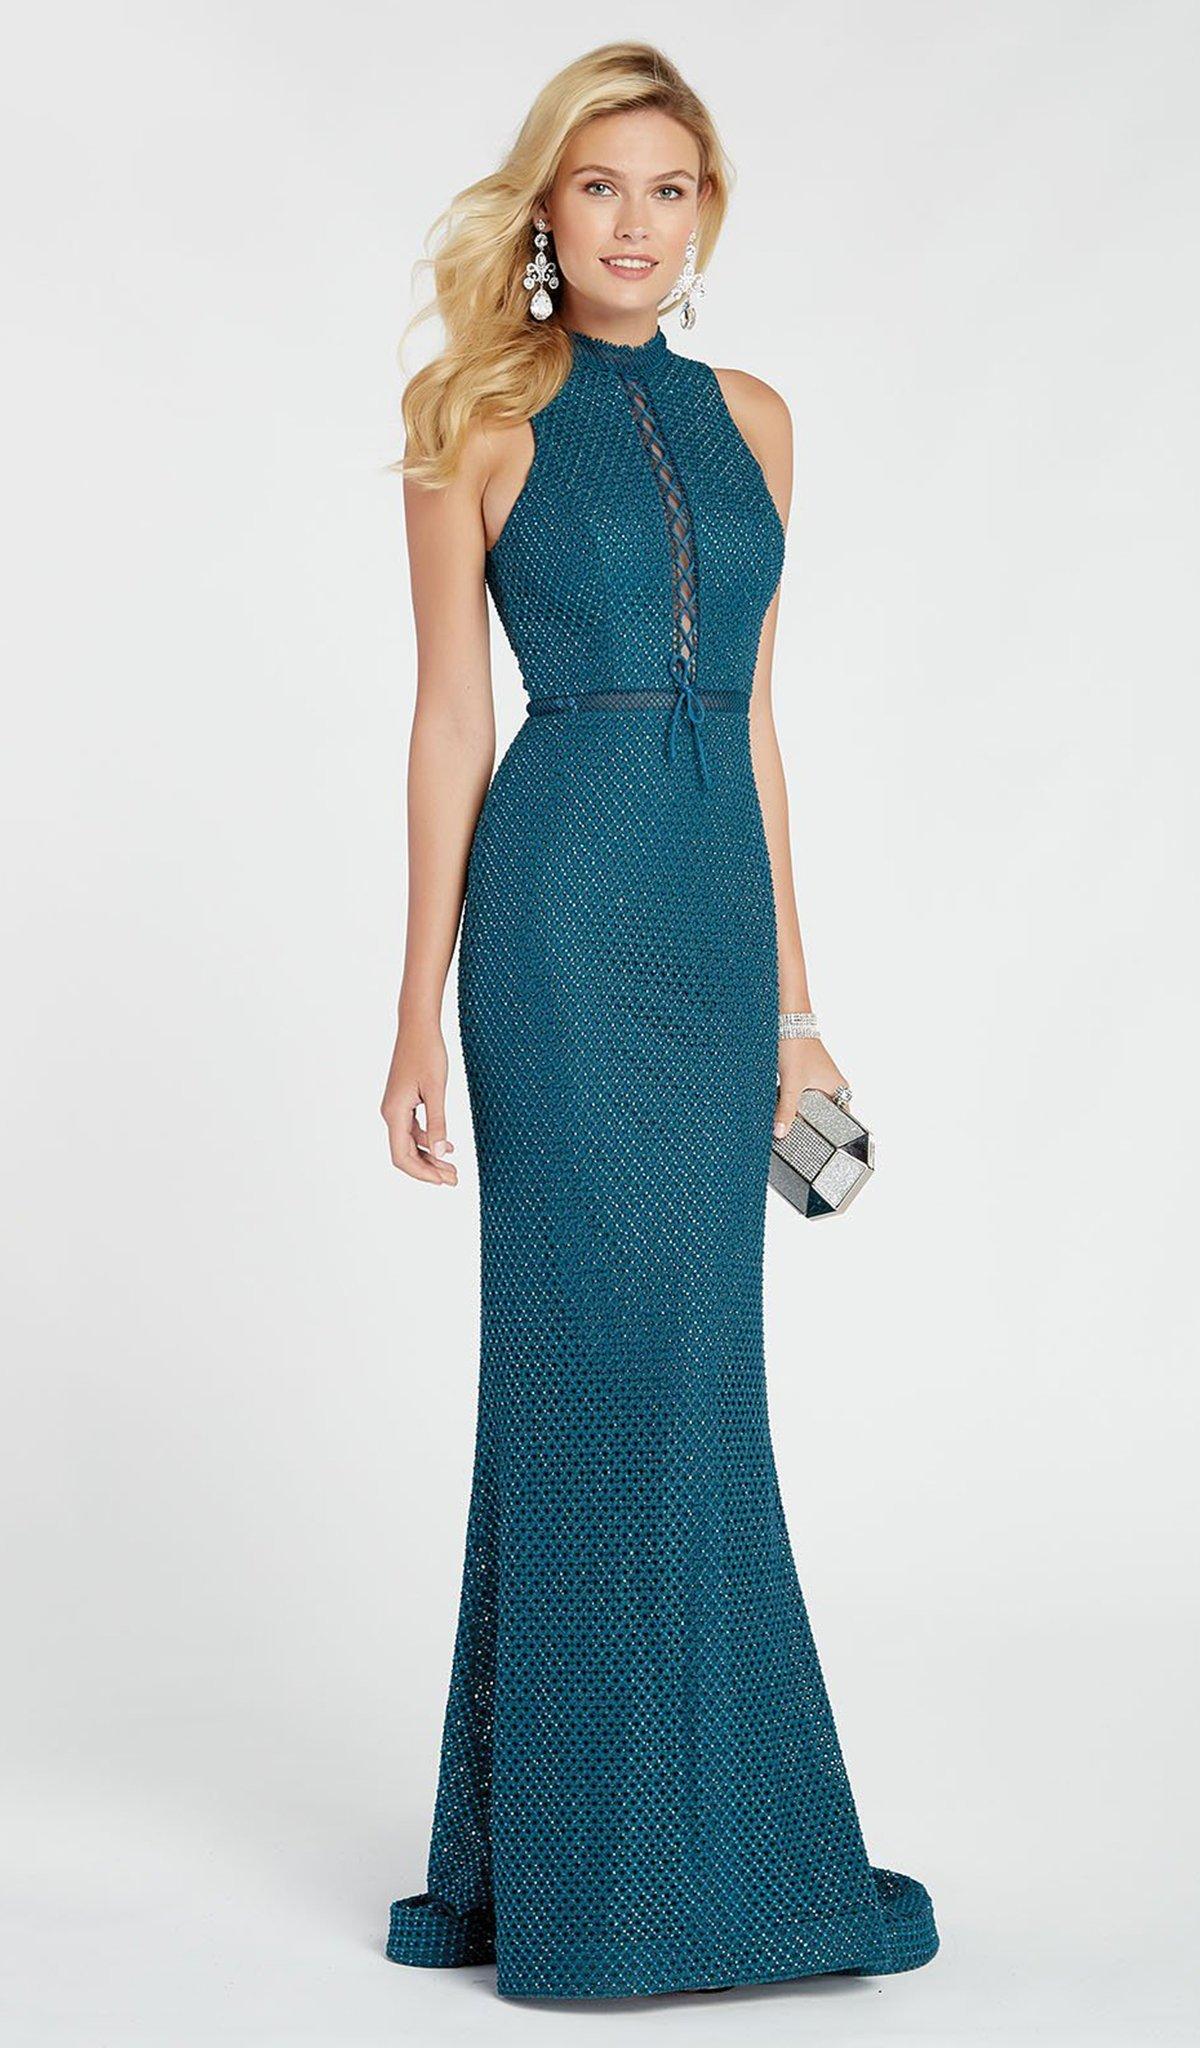 Alyce Paris - 60318 Diamond Lace High Halter Dress With Open Back